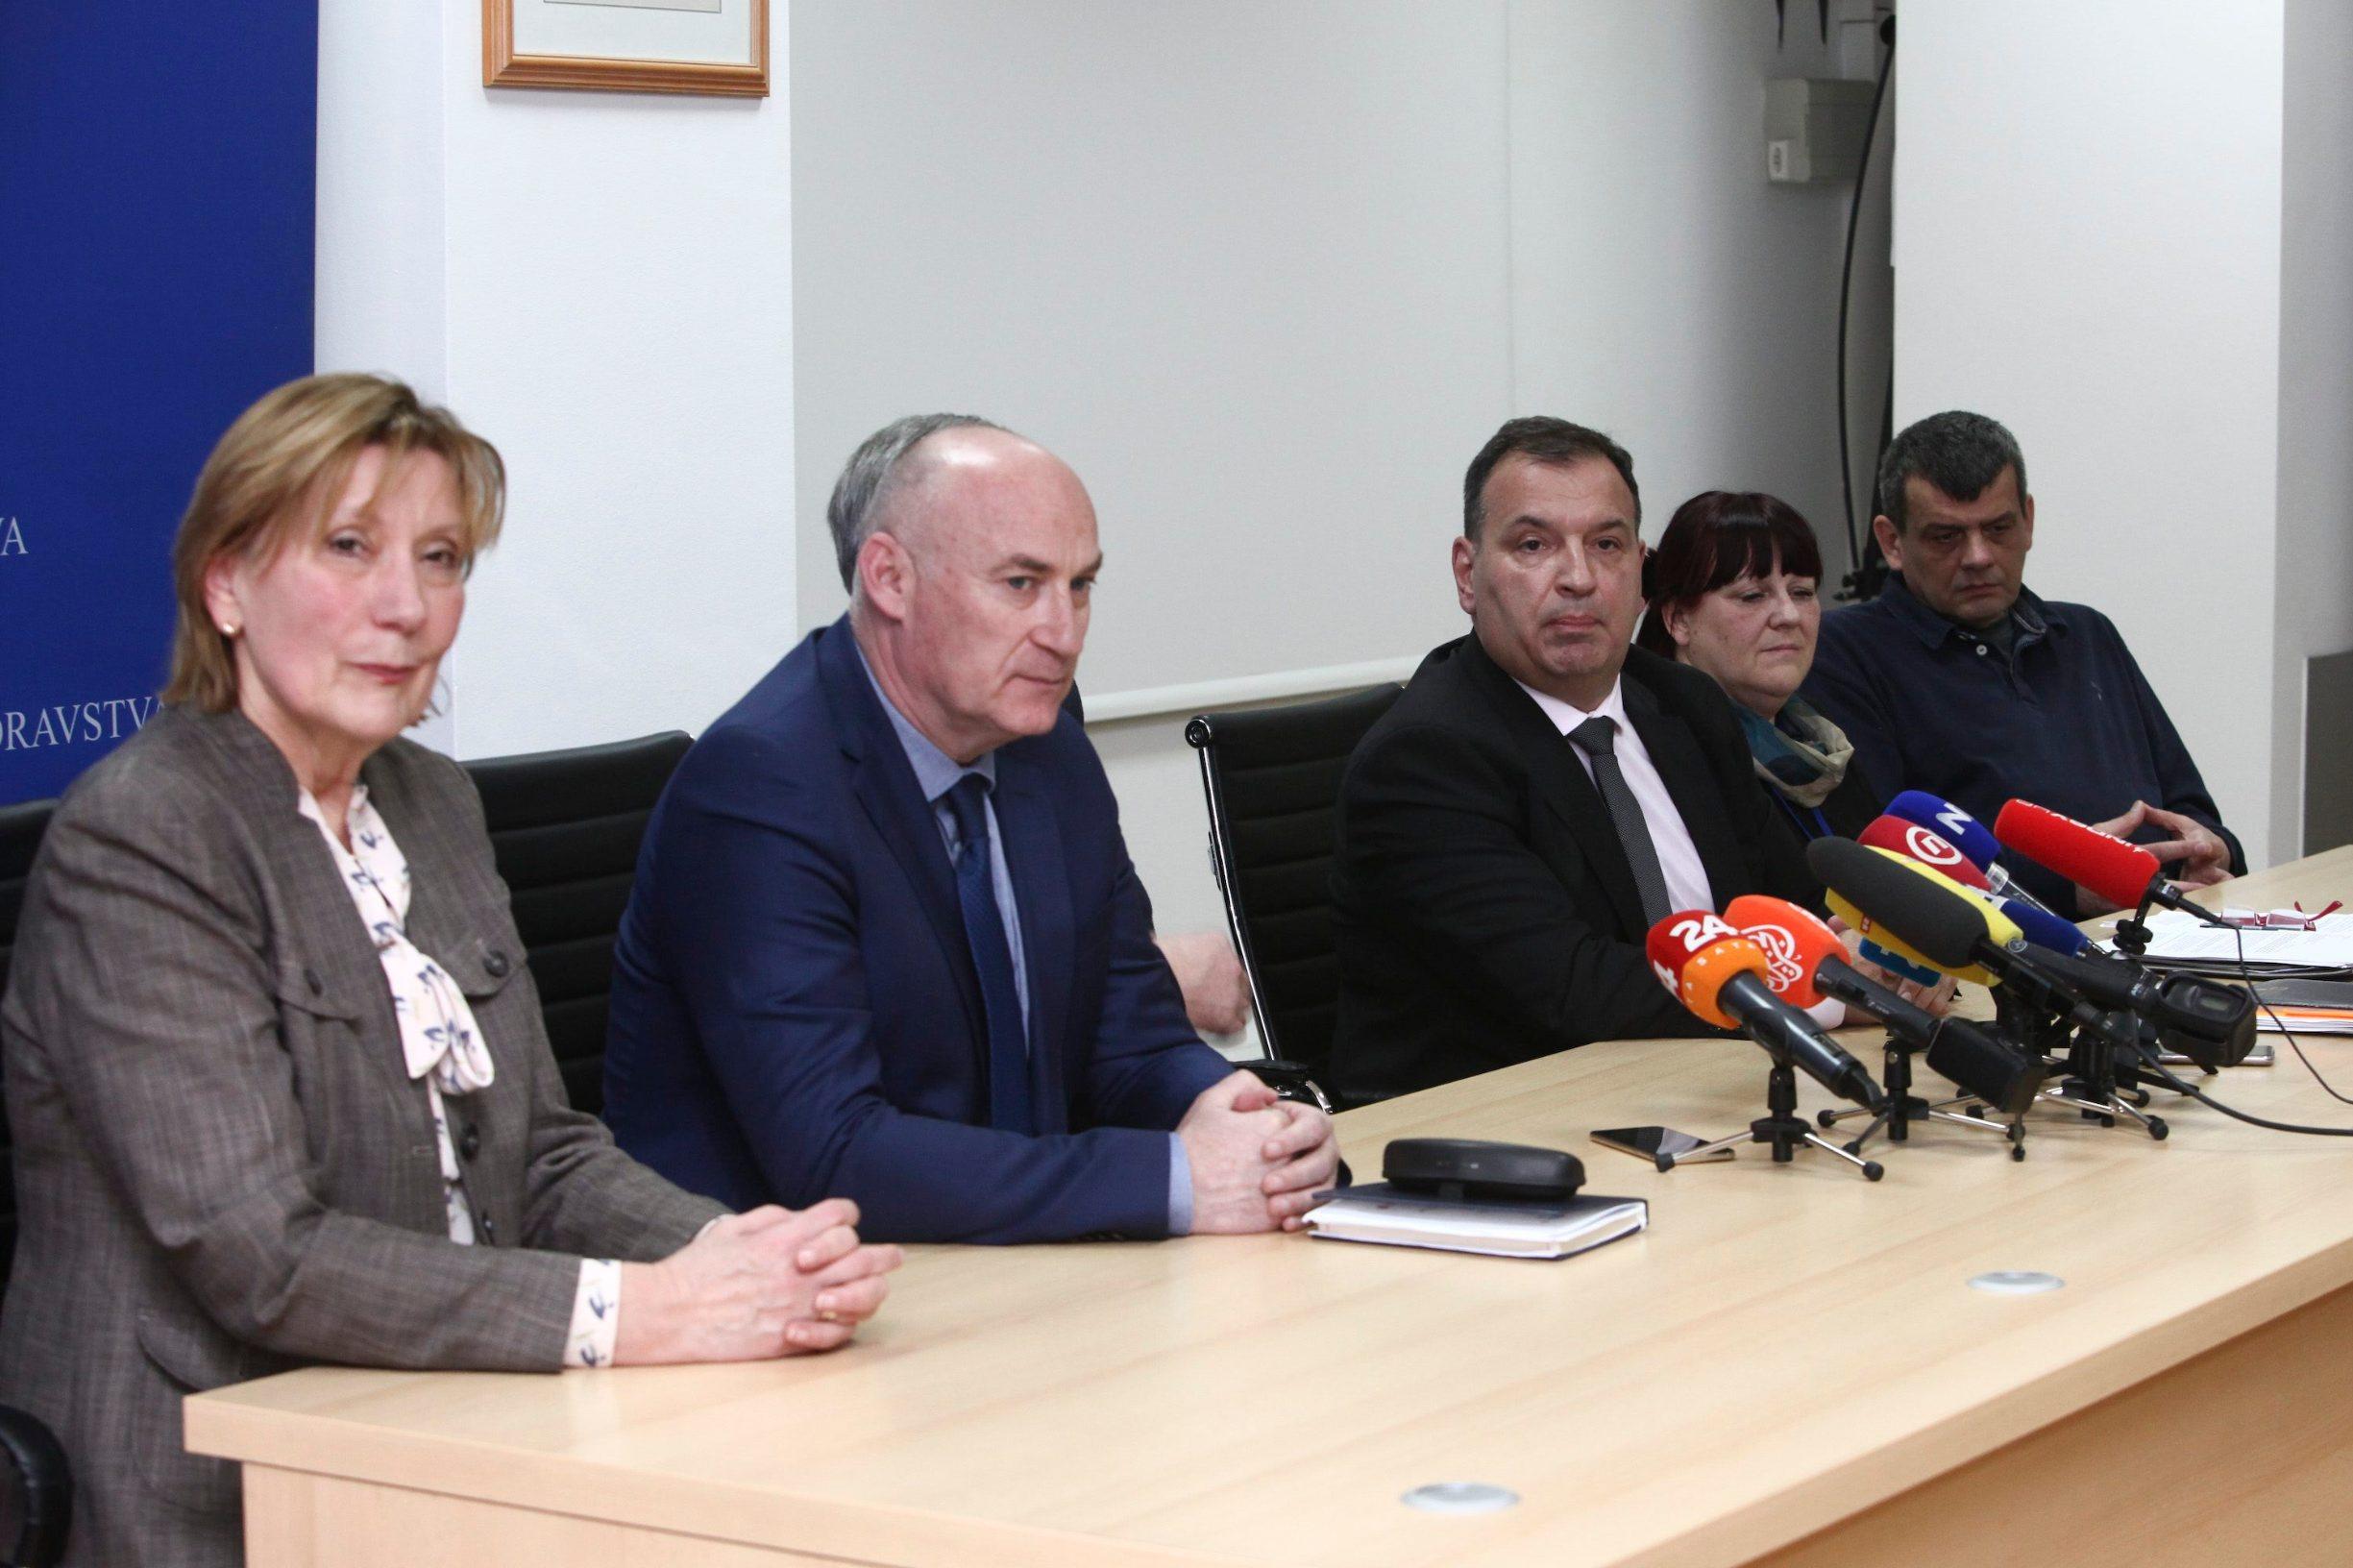 Spomenka Uremović, Damir Trut, Maja Grba Bujević, Vili Beroš, Krunoslav Capak, Bernard Kaić